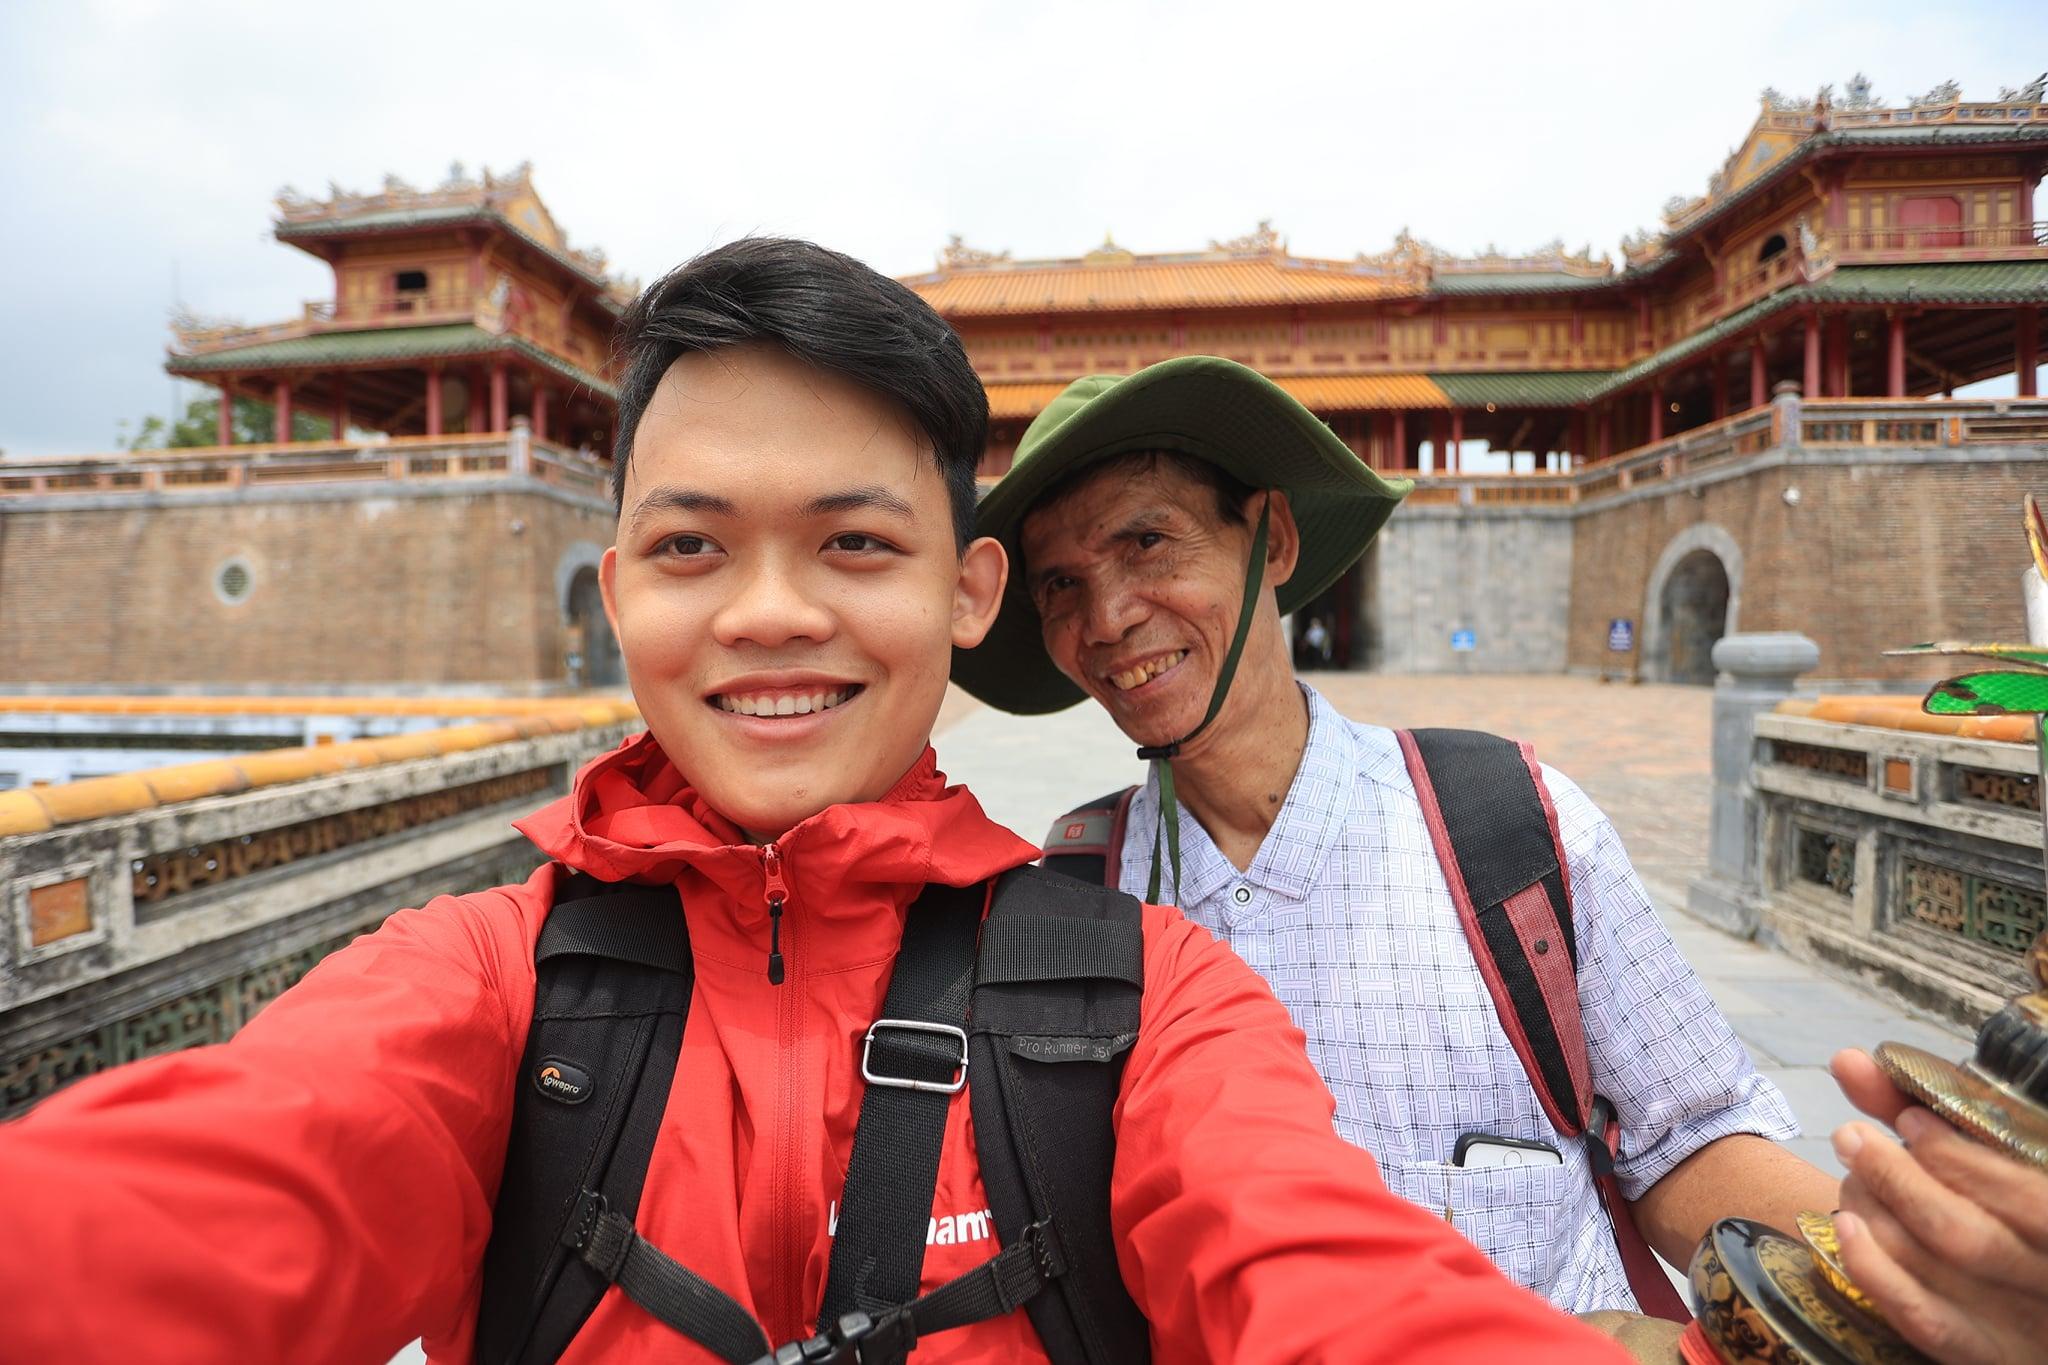 Chu Dinh Hoa (R) and Hoang Tien Dat take a selfie while visiting Hue in April 2021. Photo: Hoang Tien Dat